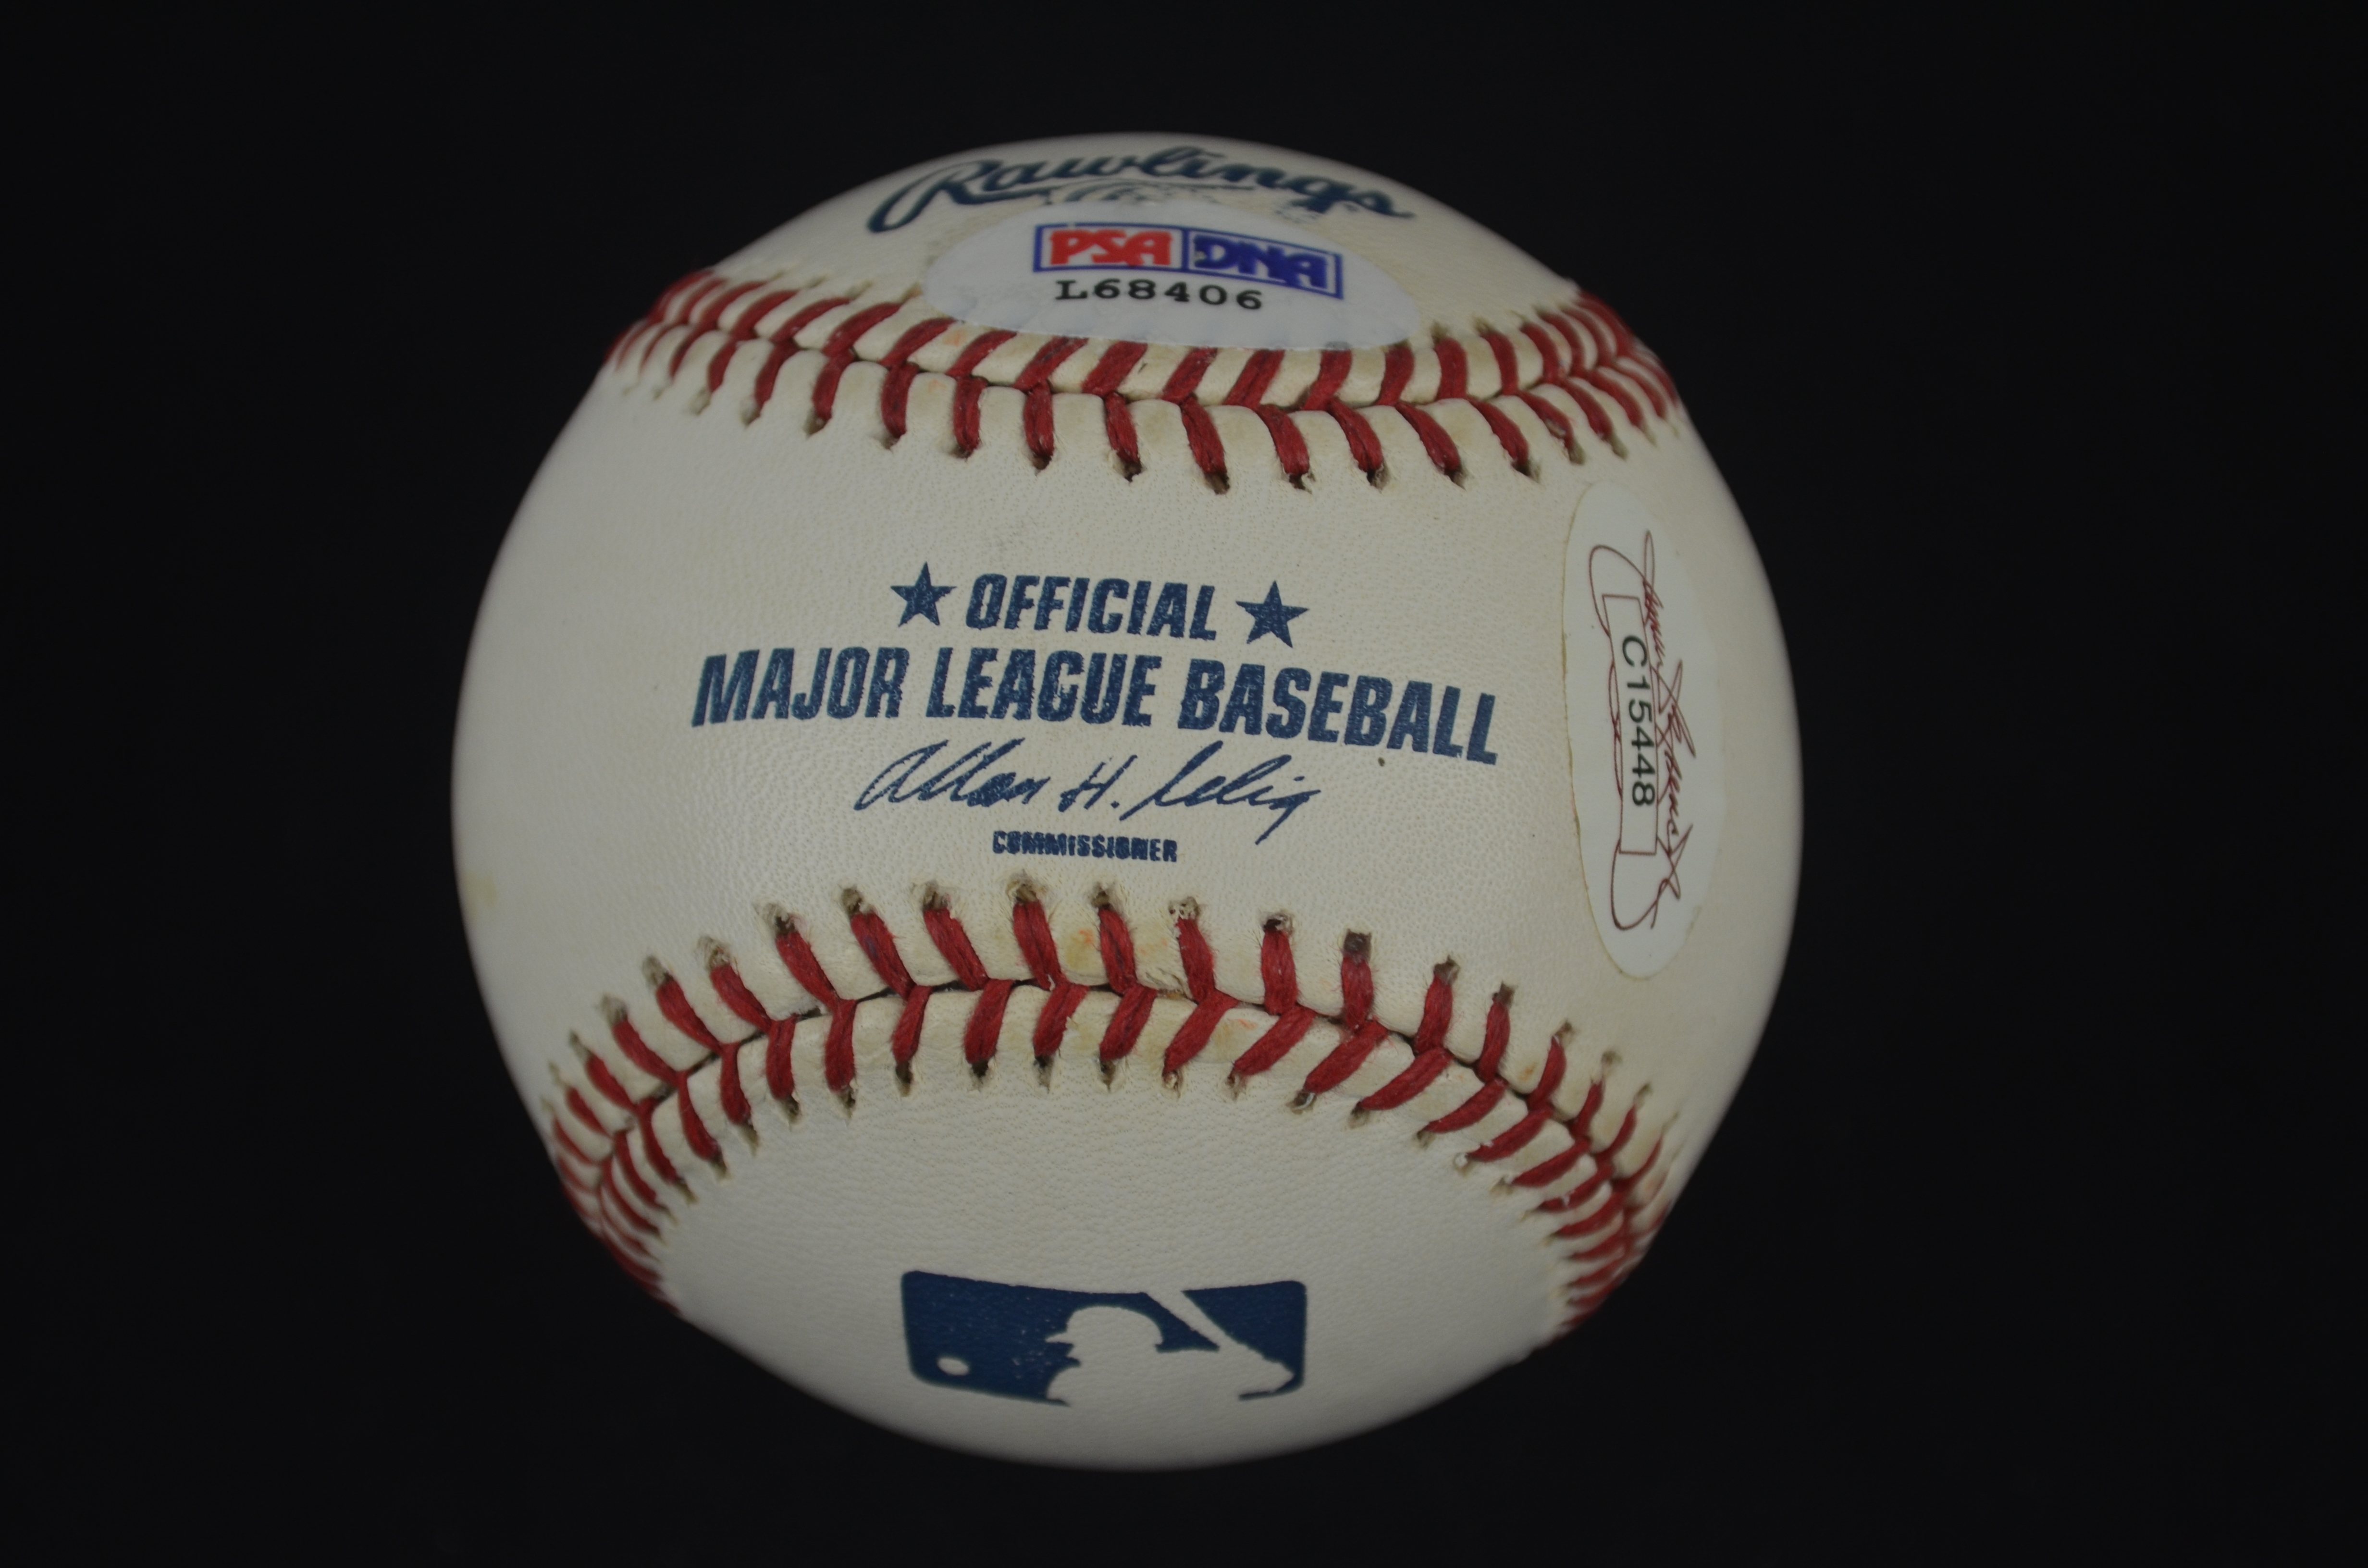 d8bcc31618 Ken Griffey Jr Autographed Baseball, Ken Griffey Jr Autographed Baseball ...